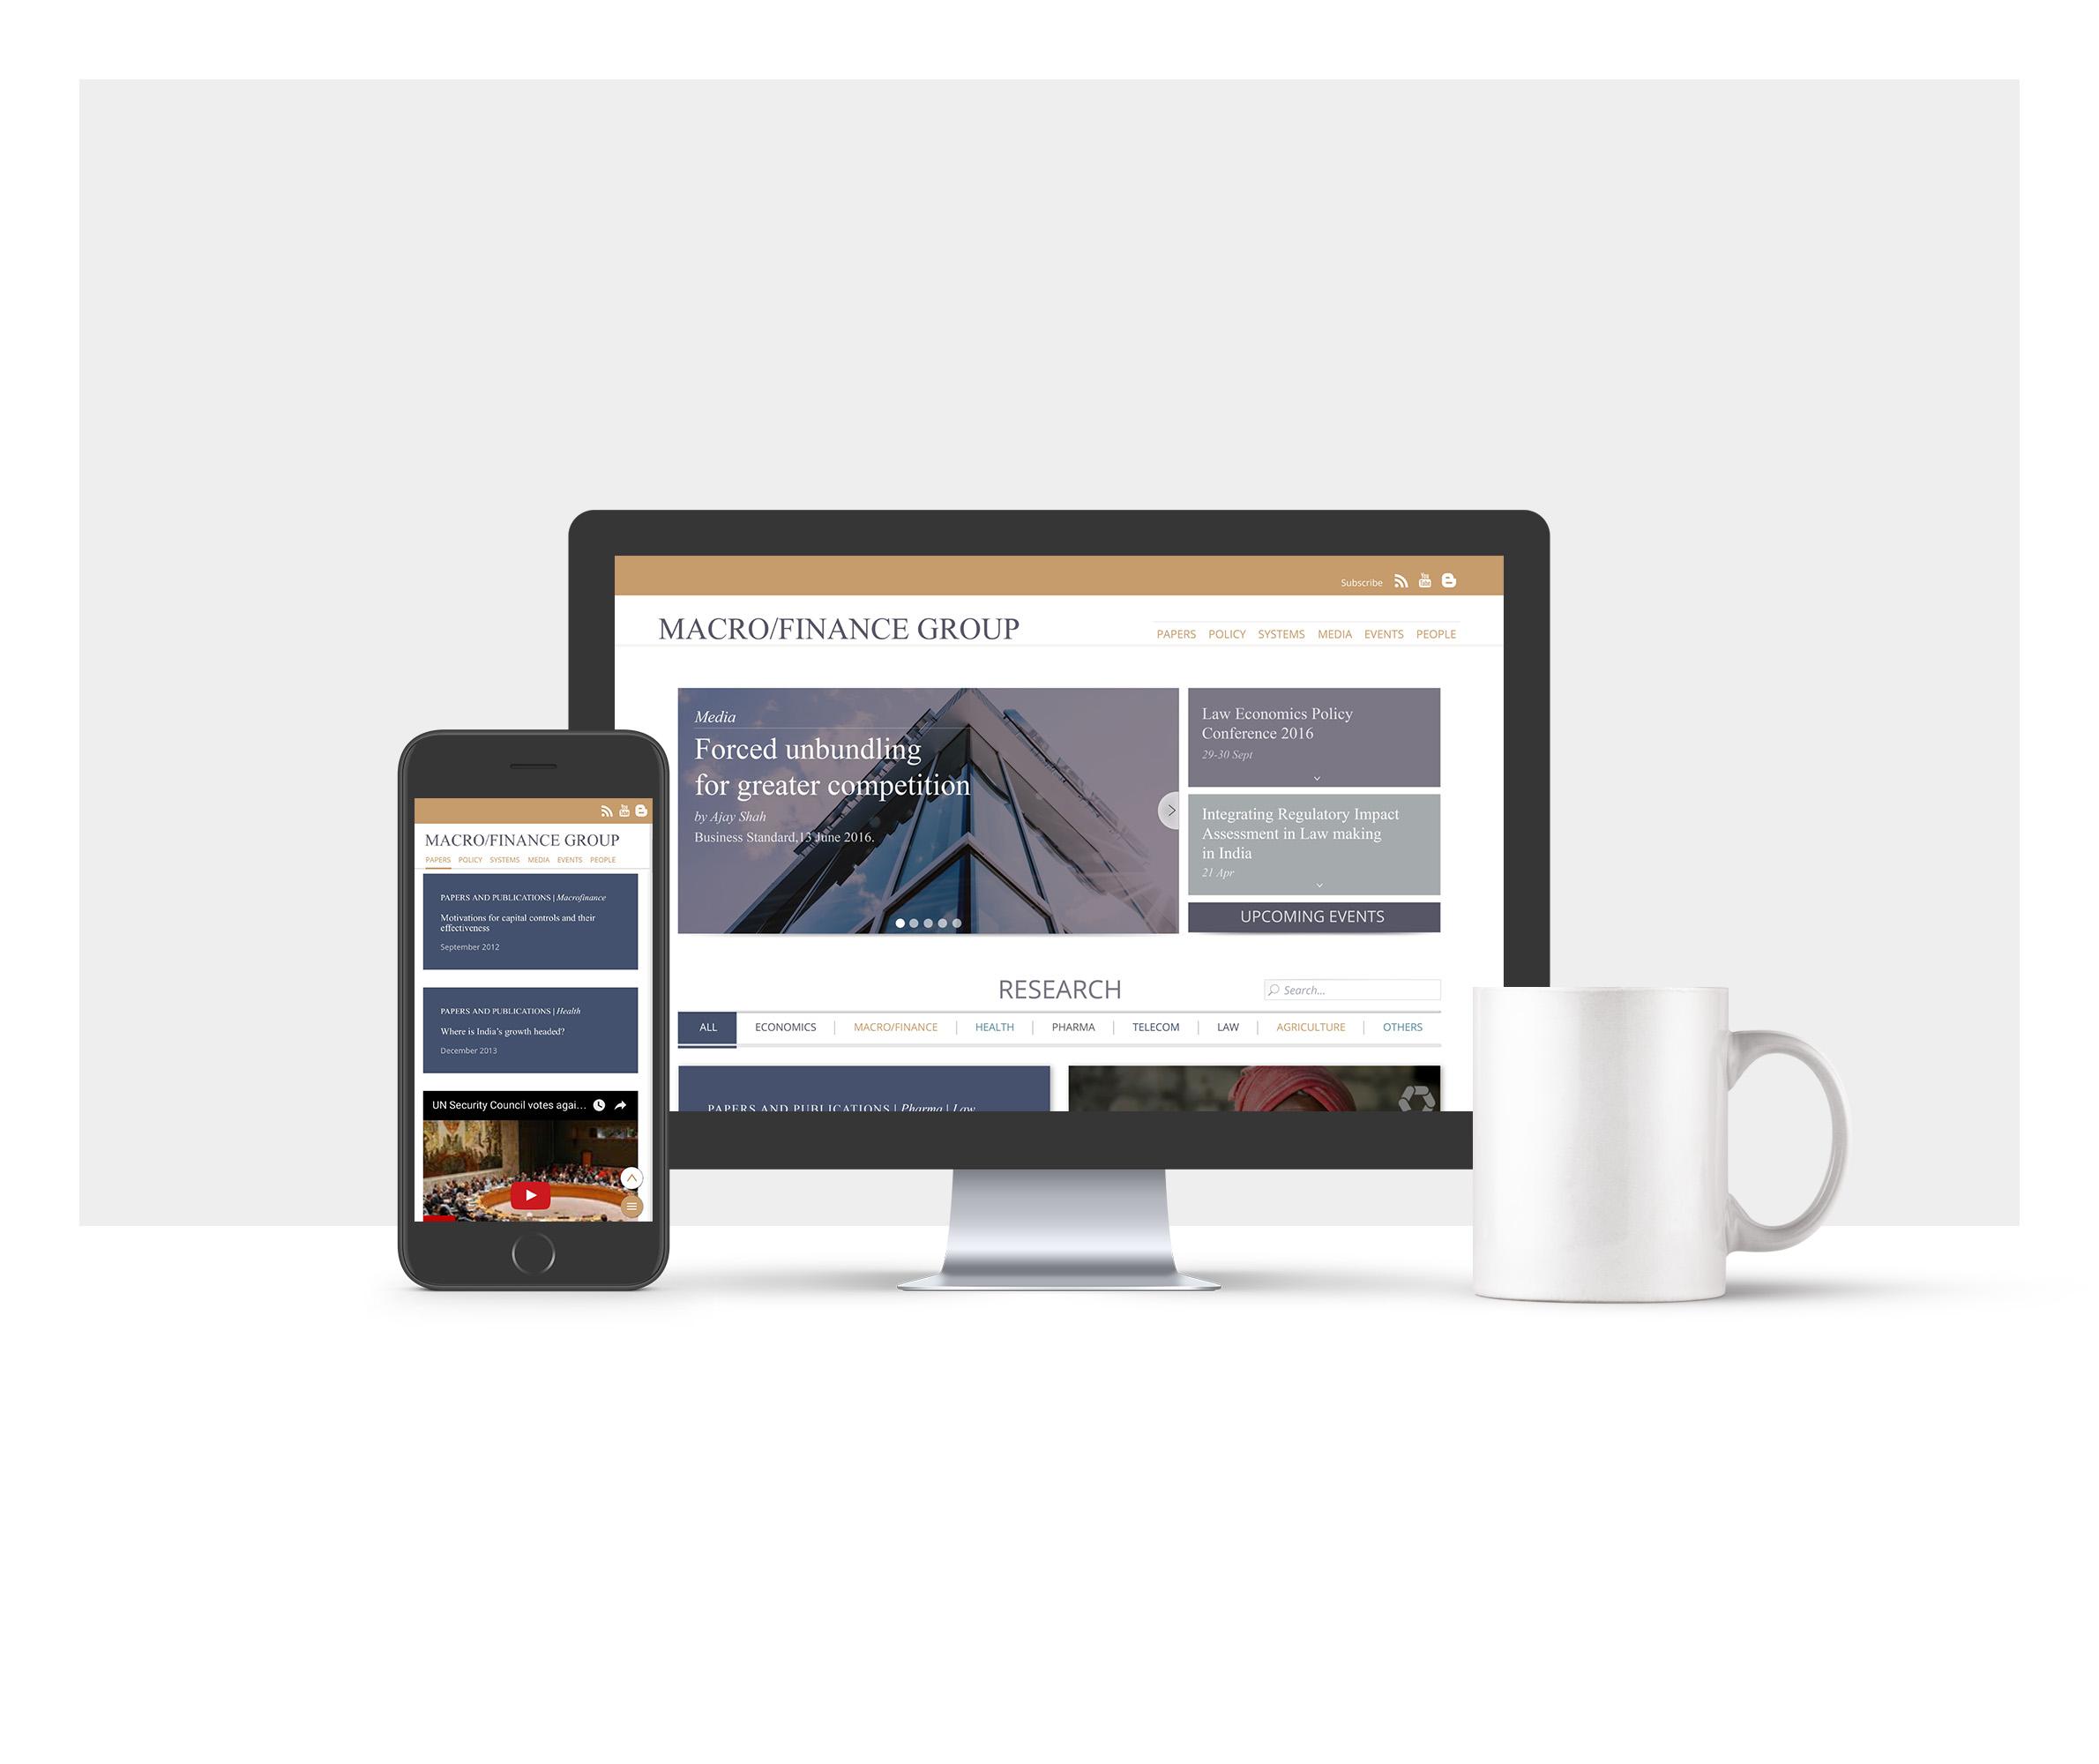 NIPFP Website Minimalist-Showcase-Project-Presentation.jpg